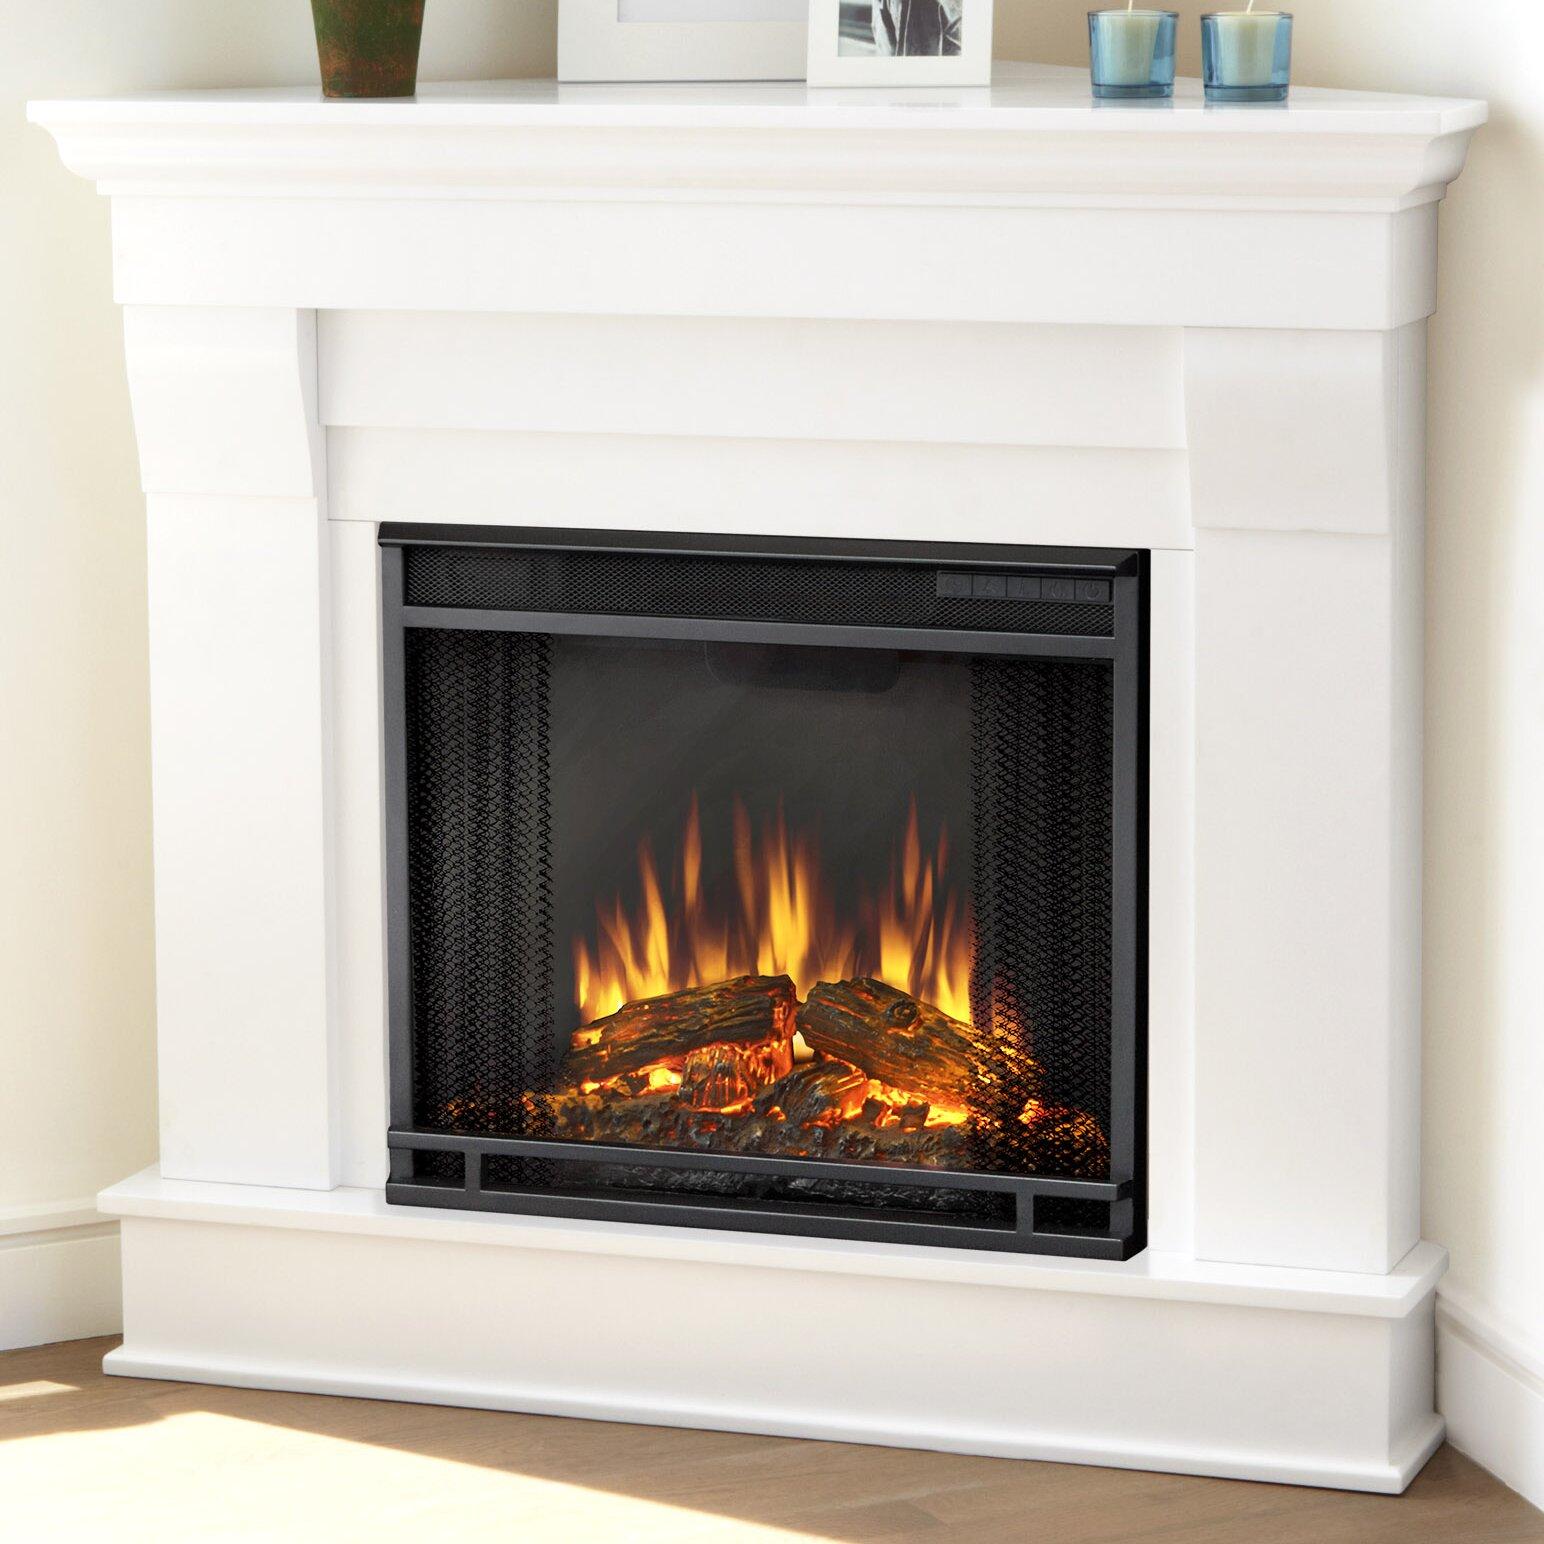 Real Flame Chateau Corner Electric Fireplace - Real Flame Chateau Corner Electric Fireplace & Reviews Wayfair